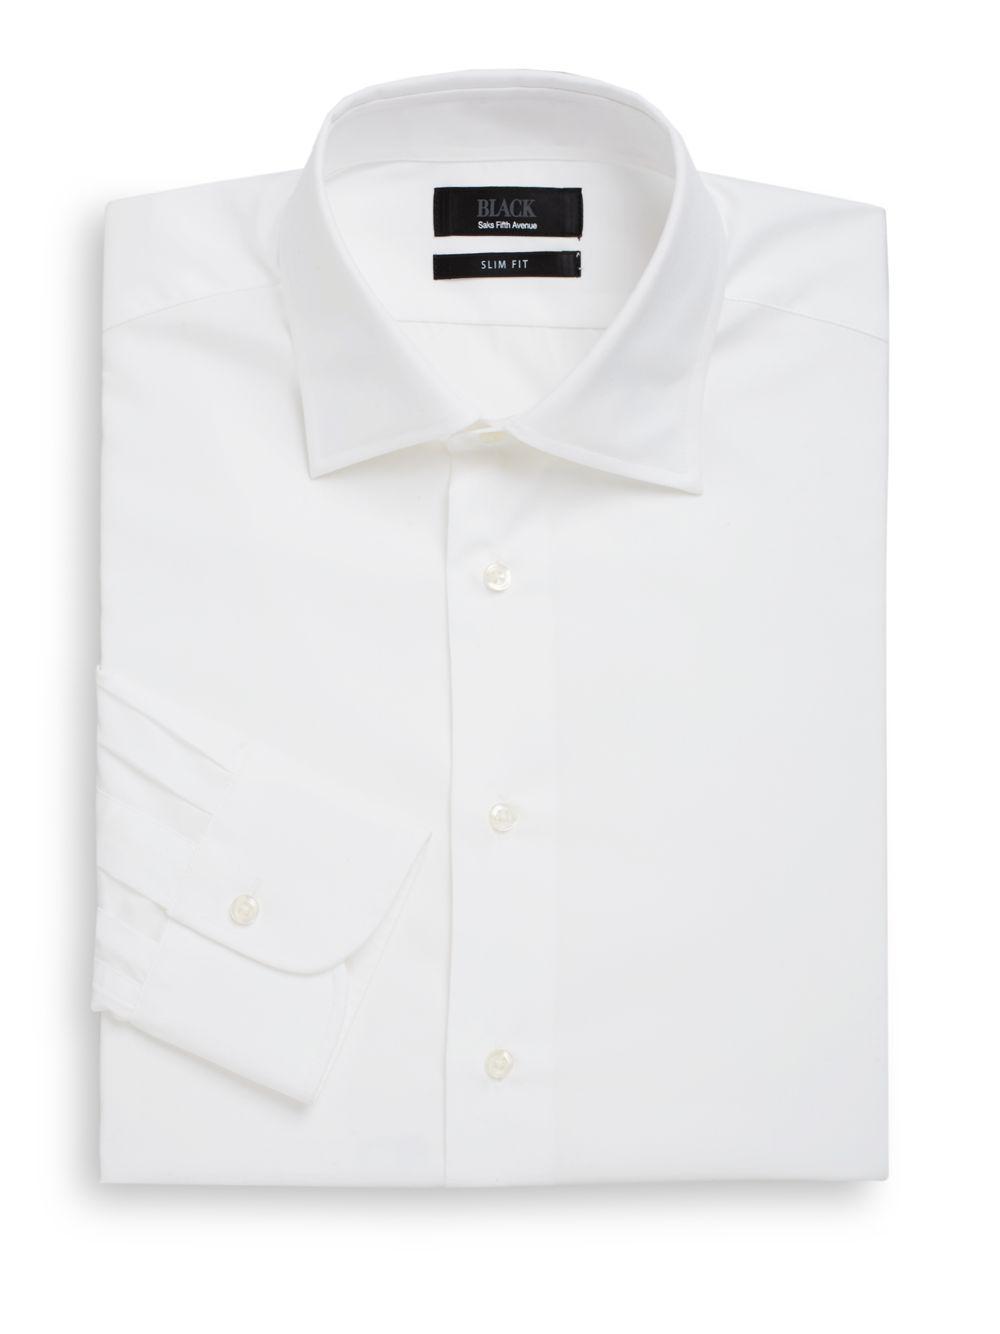 Lyst Saks Fifth Avenue Black Slim Fit Cotton Poplin Dress Shirt In